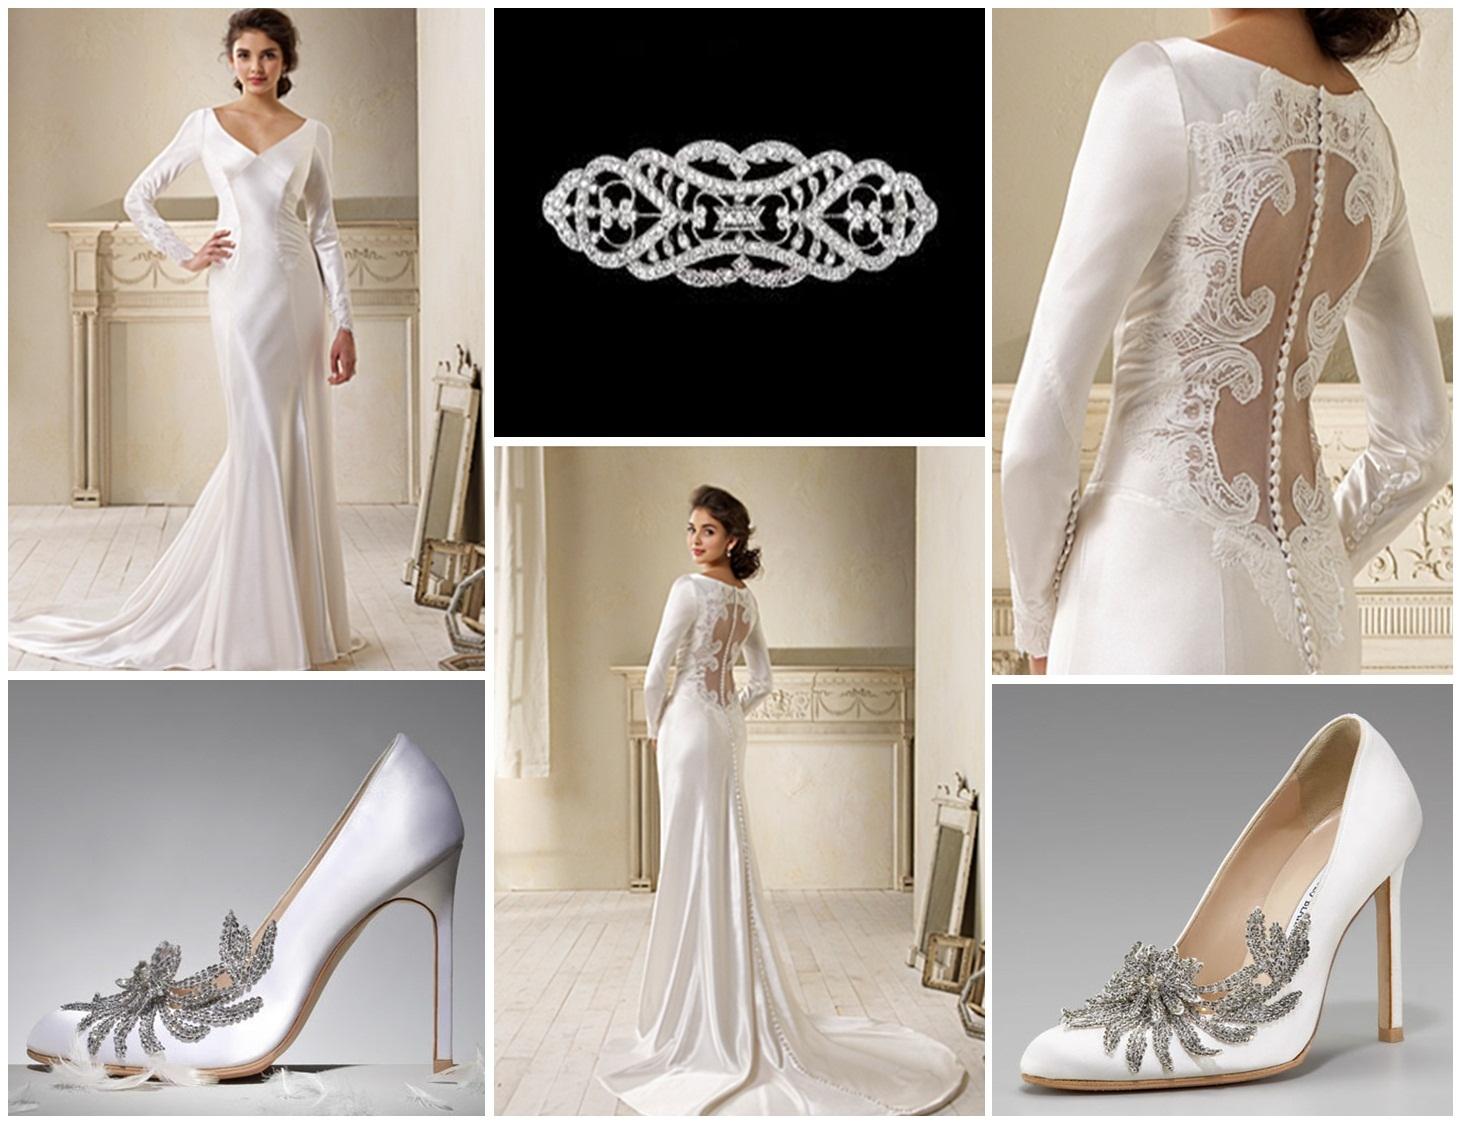 bellas wedding shoes manolo blahnik